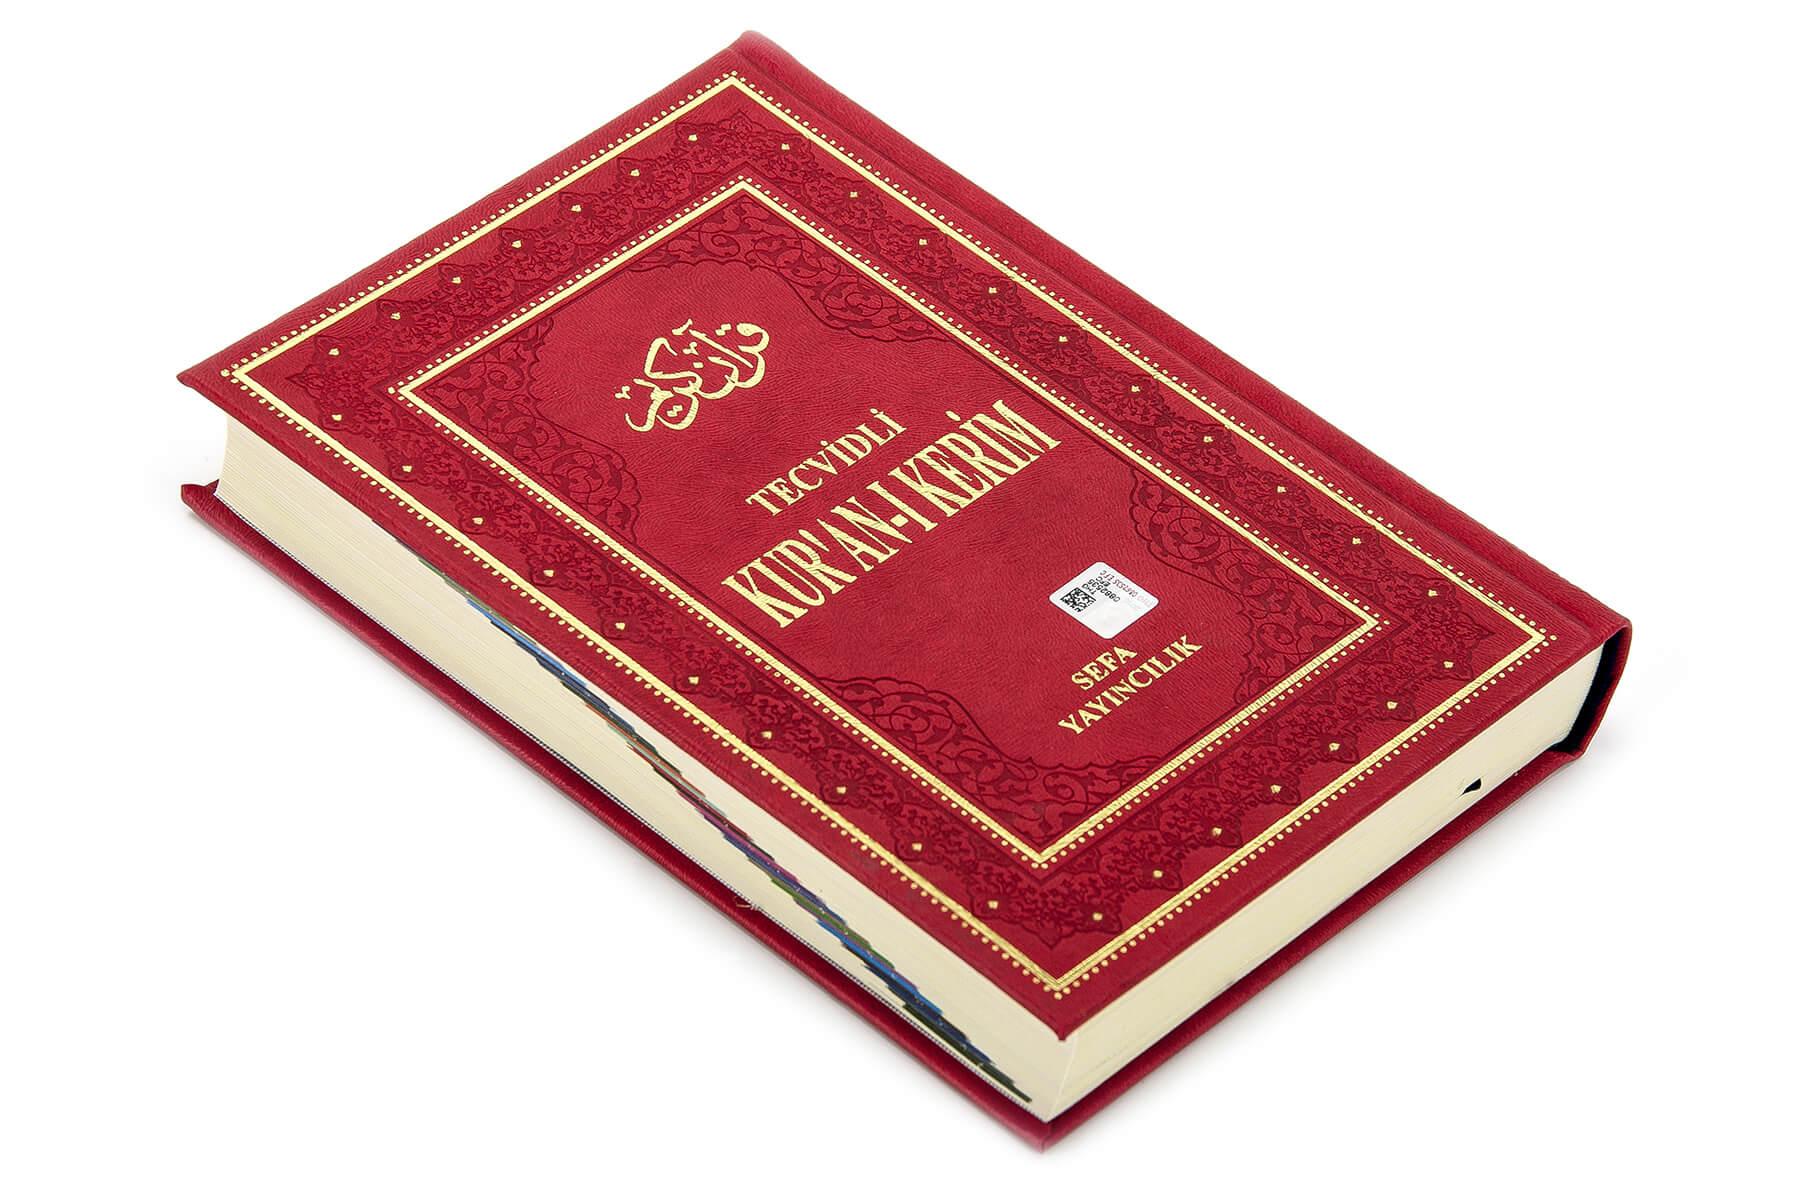 Tecvidli Kuran Karim - Thermo Leather - Medium Size - Sefa Publishing House - Computer Lined